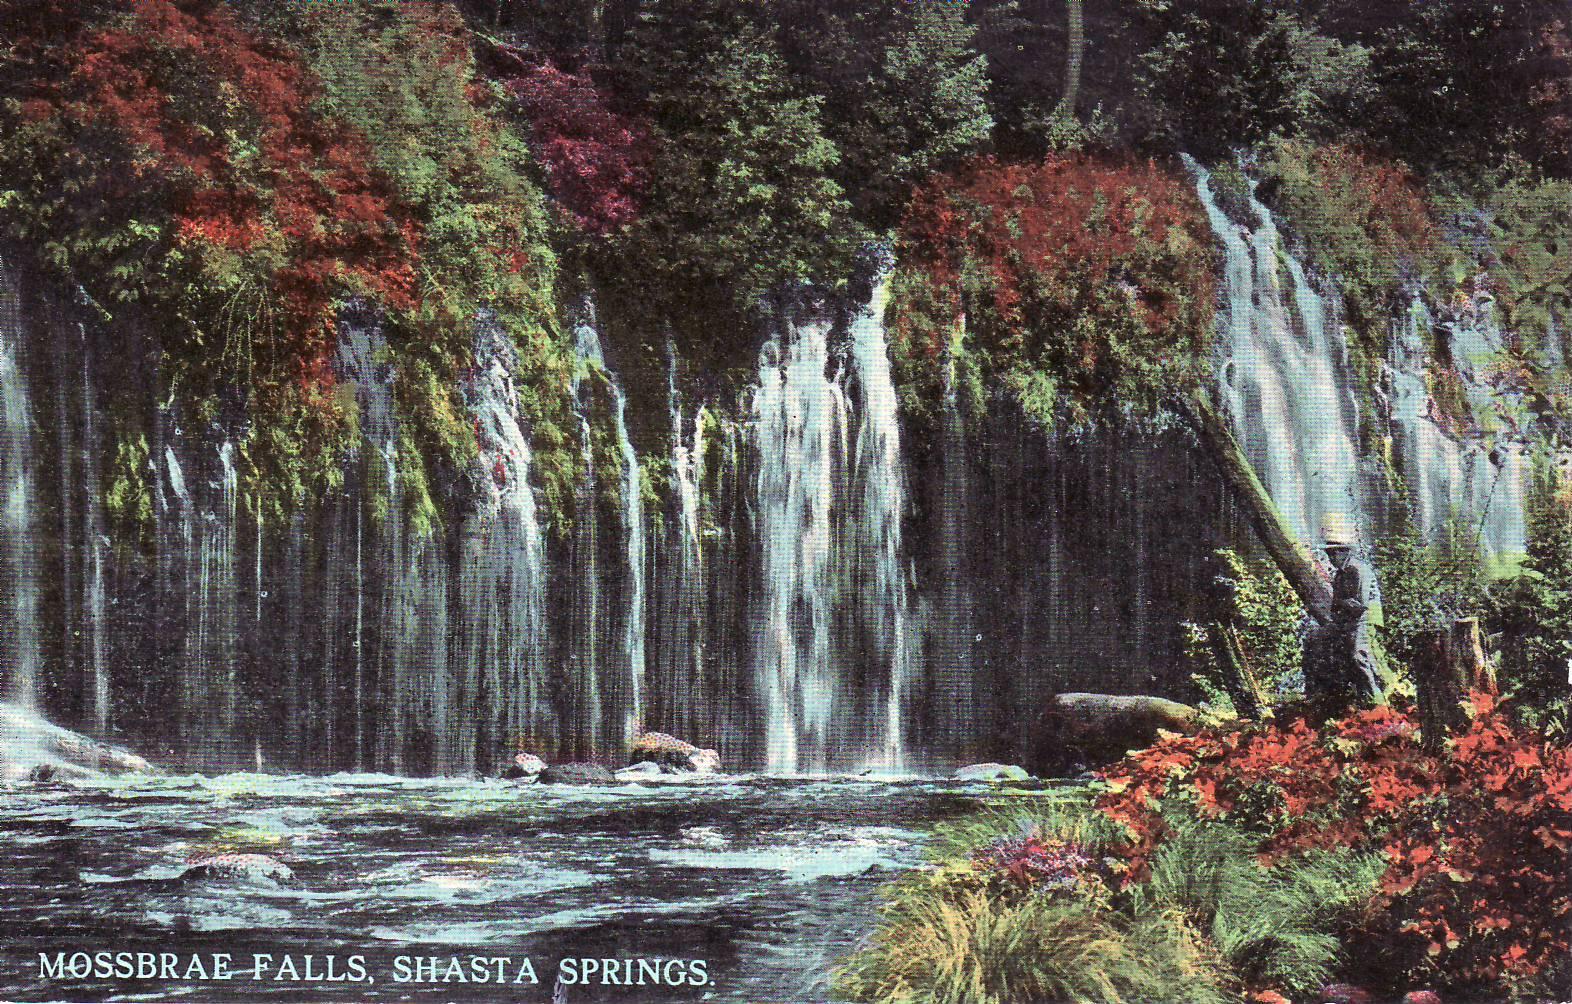 Mossbrae Falls clipart #6, Download drawings